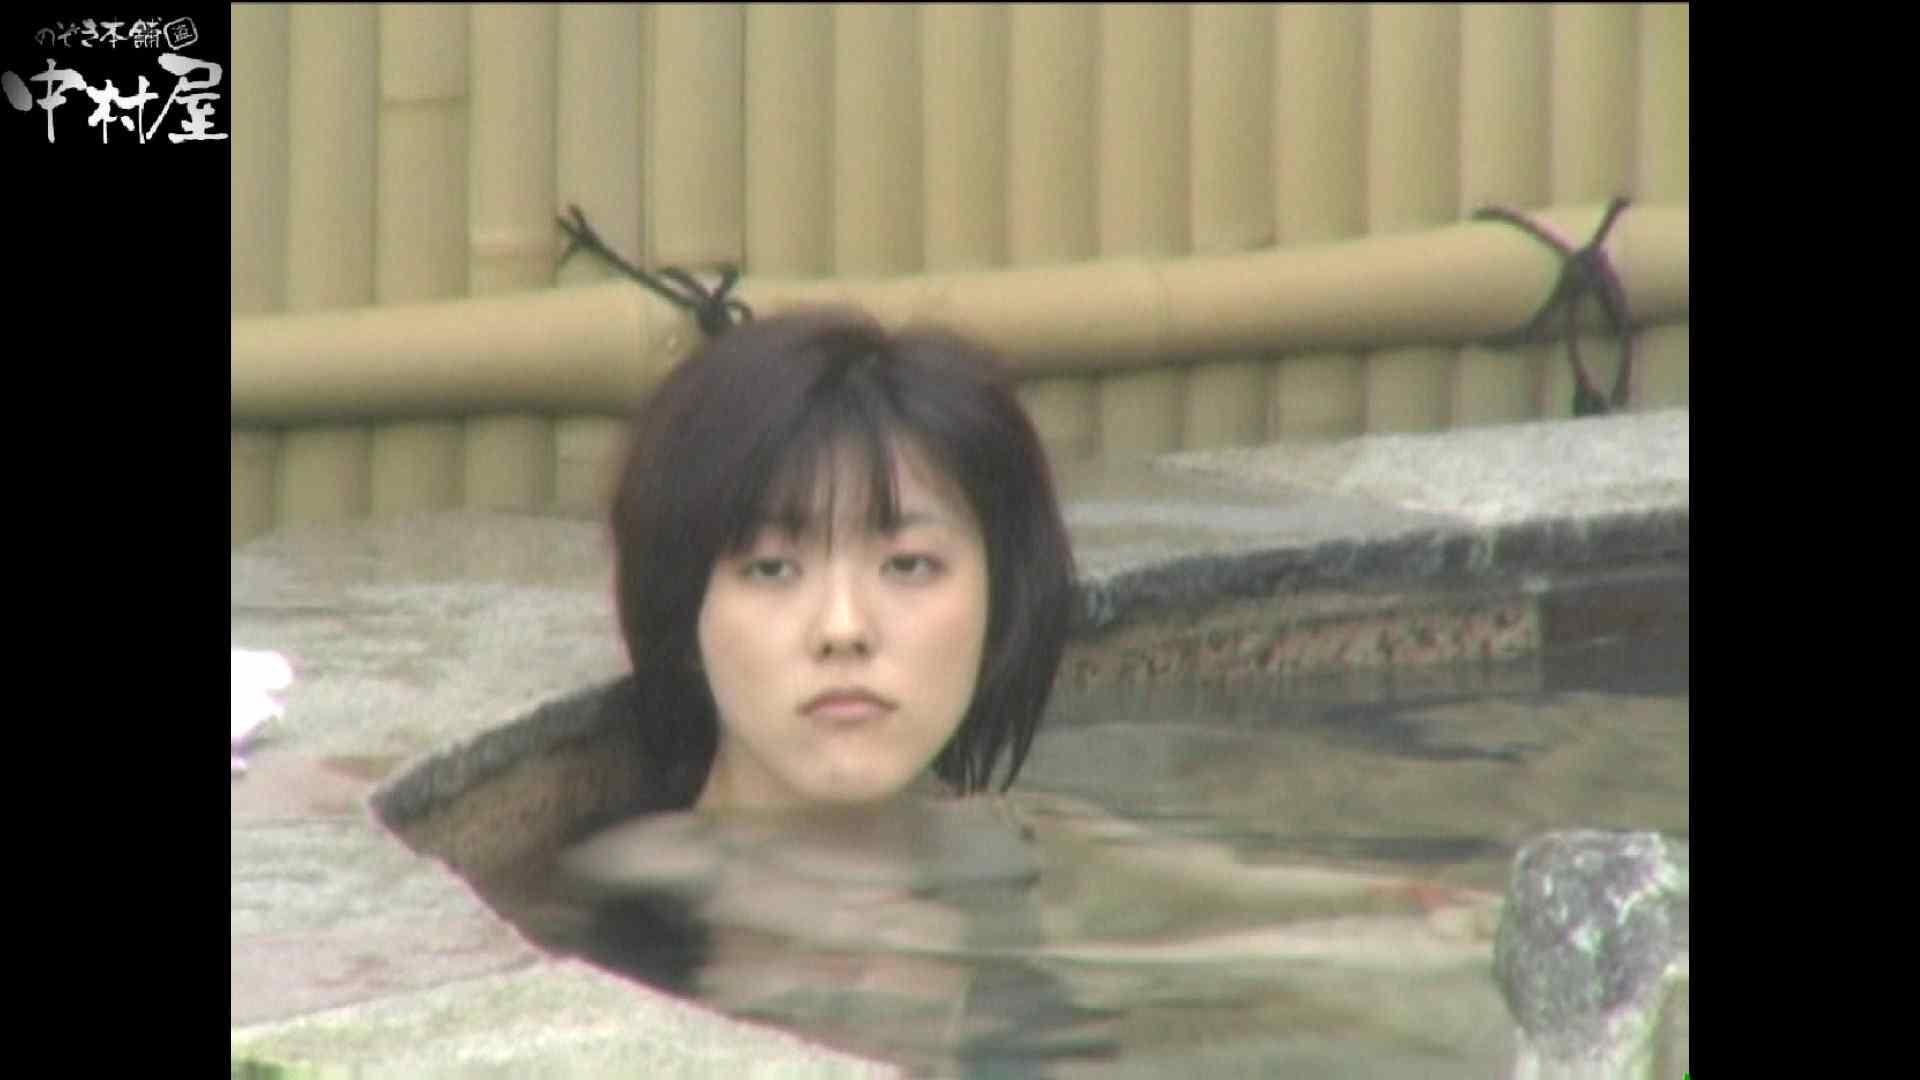 Aquaな露天風呂Vol.975 HなOL | 露天  54pic 5